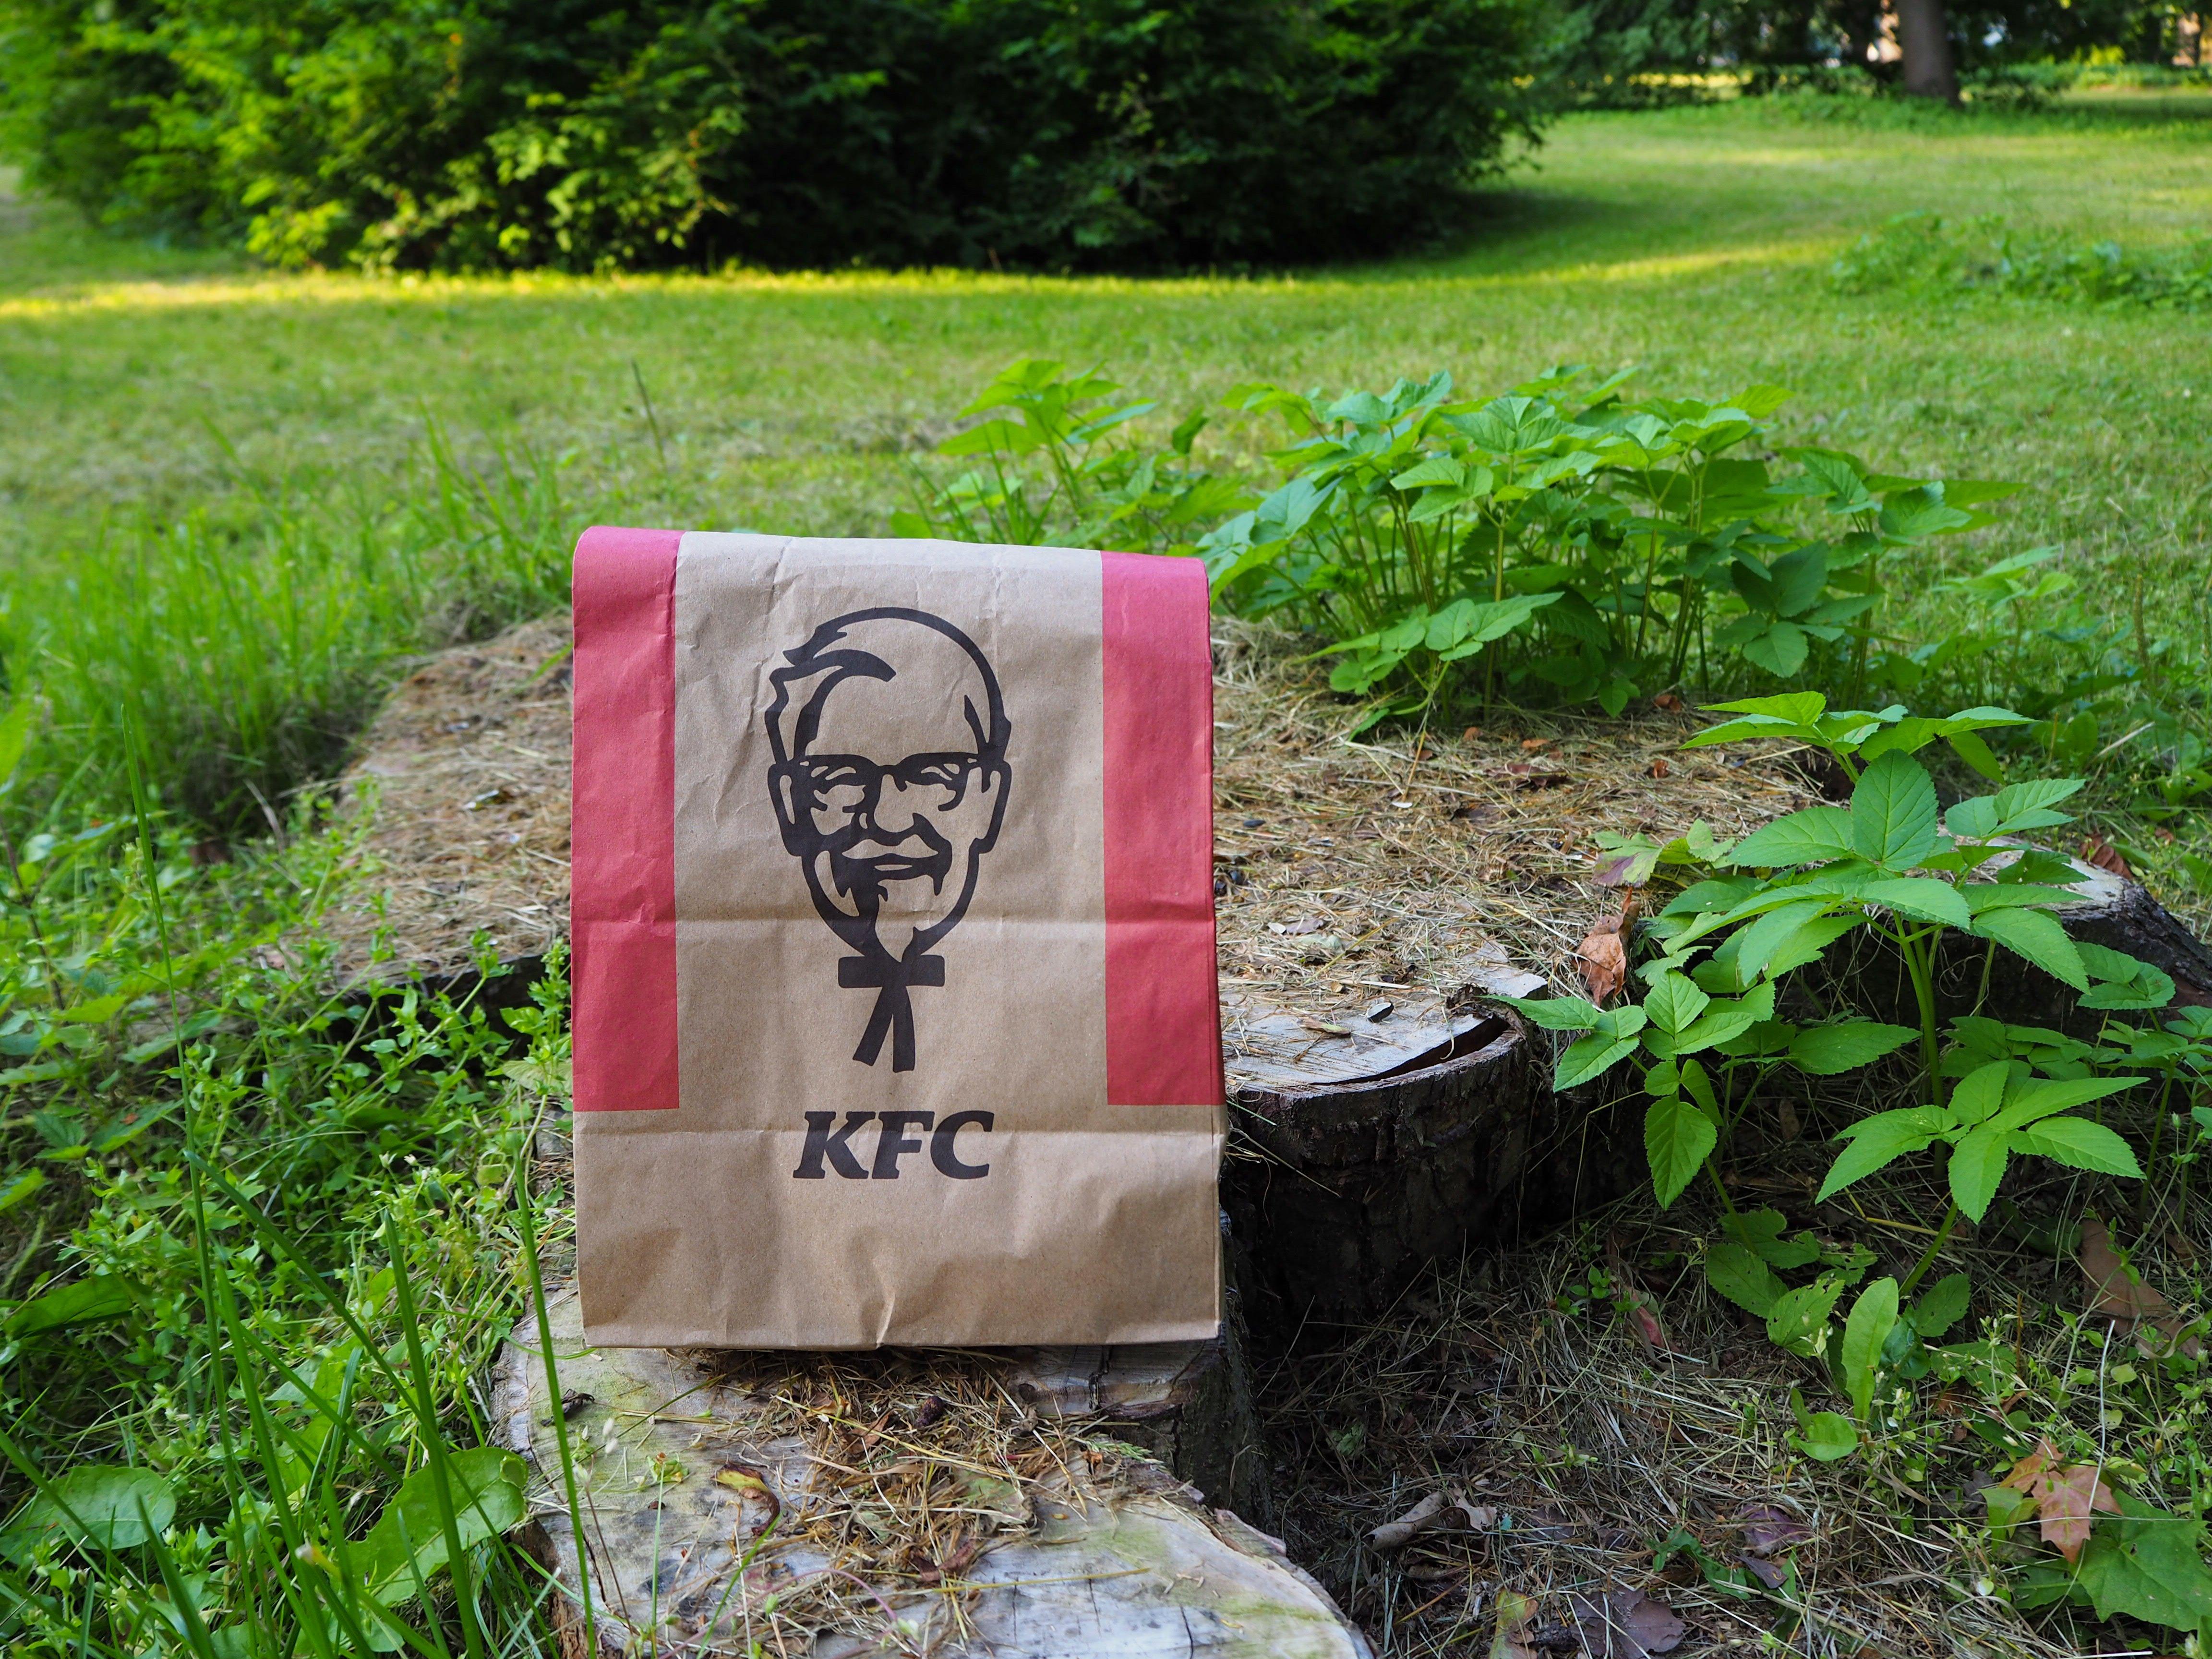 food service market research kfc bag